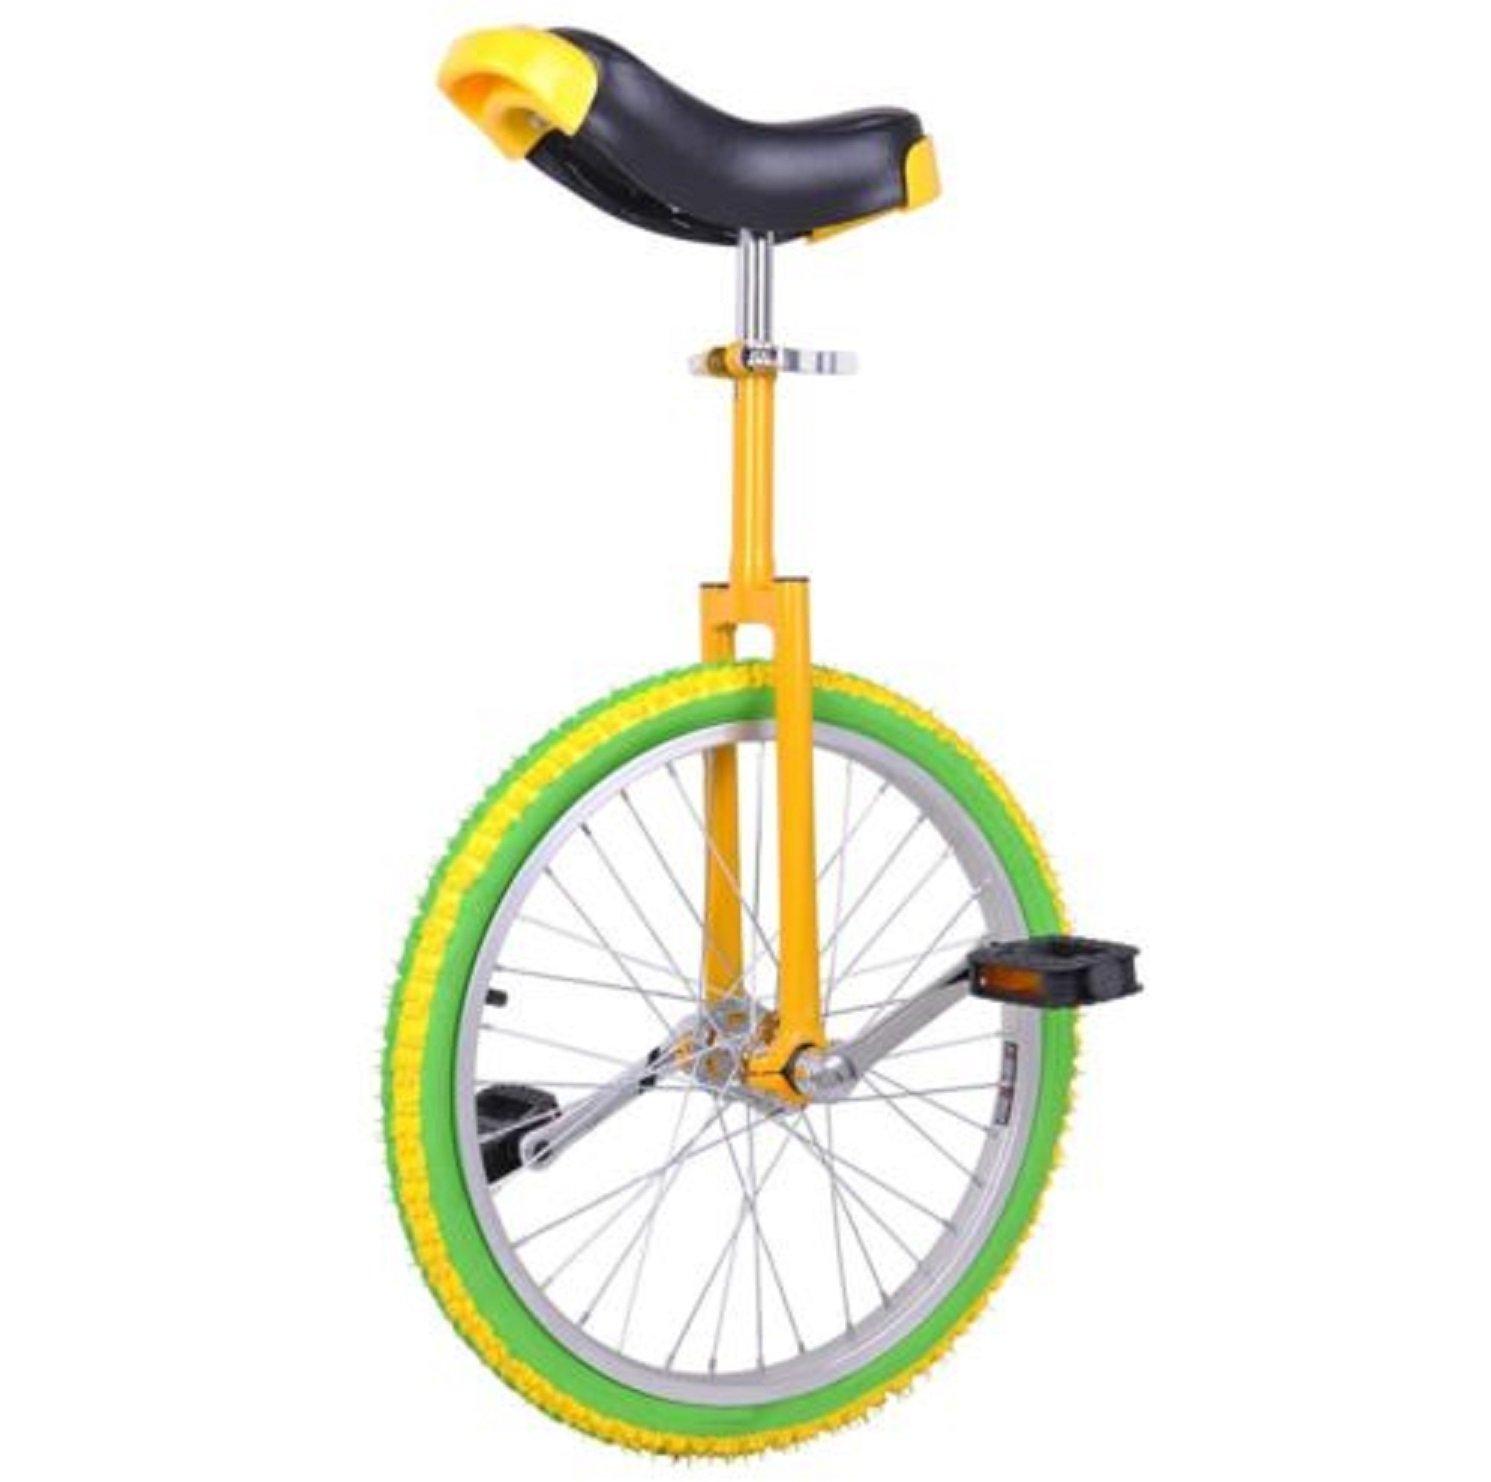 20'' Adjustable Height Leakproof Mountain Tire Unicycle Wheel Cycling Yellow